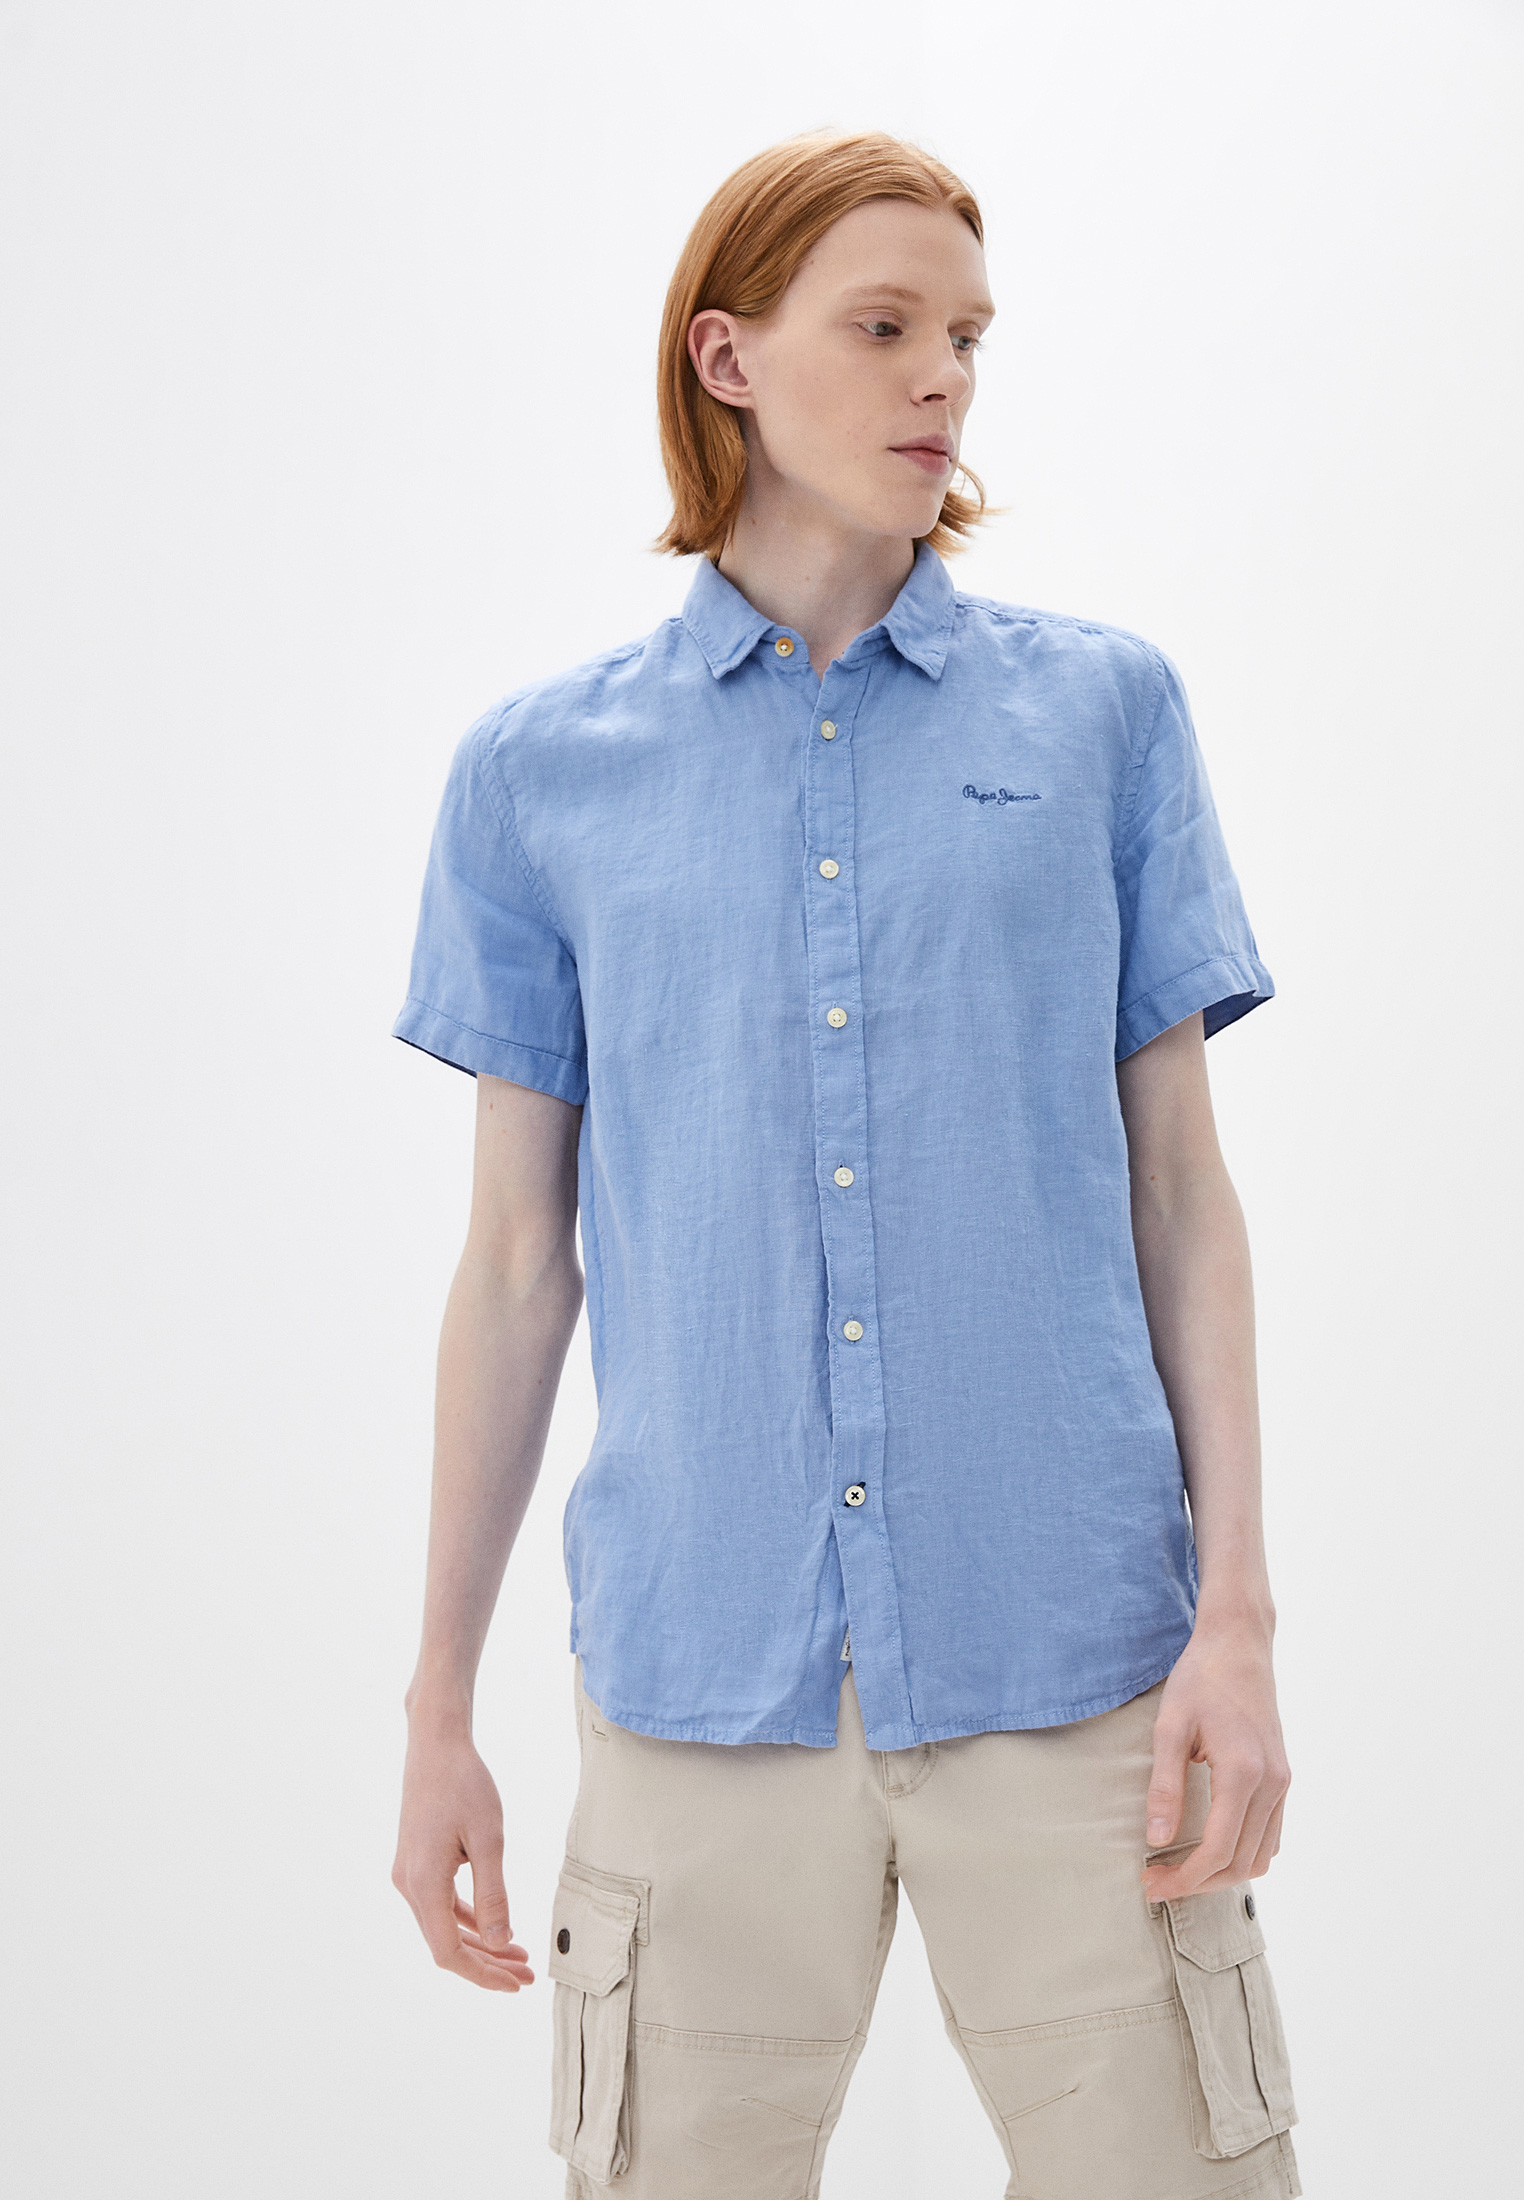 Рубашка с длинным рукавом Pepe Jeans (Пепе Джинс) PM307057